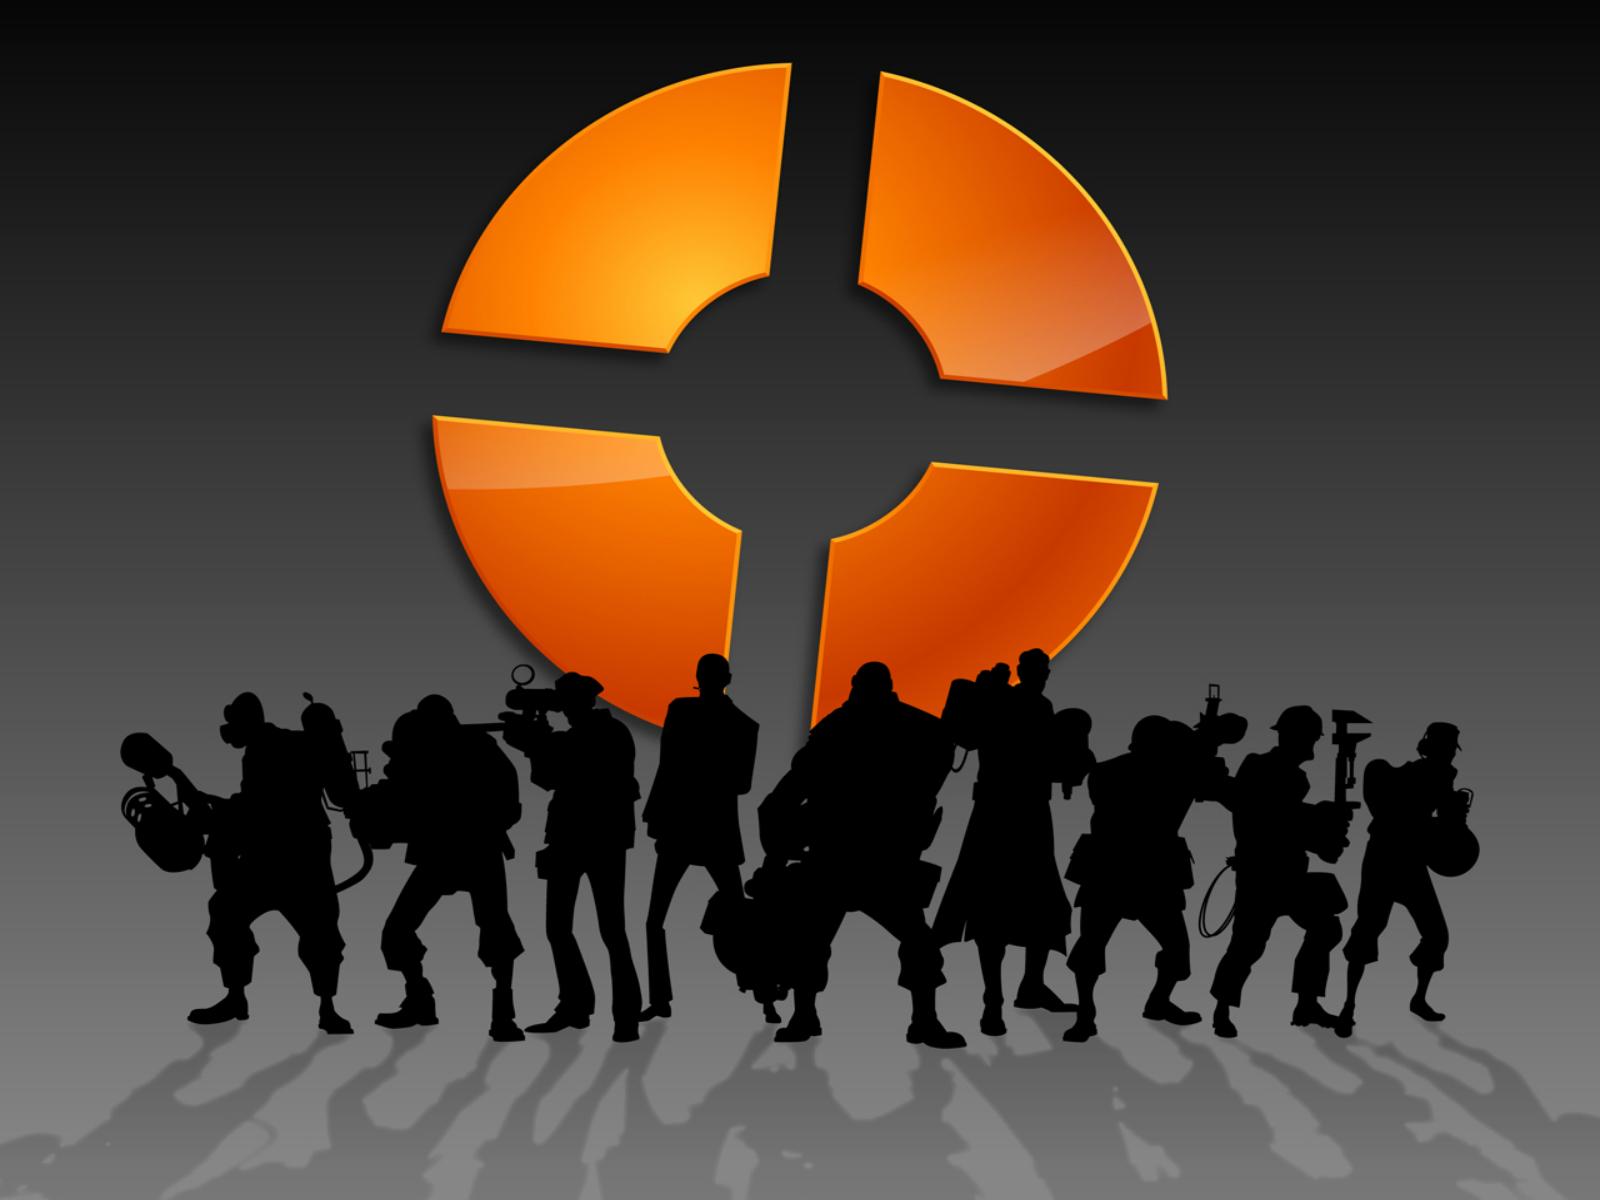 http://3.bp.blogspot.com/-JuJSftUdqLs/TmVD24qX7VI/AAAAAAAAAzM/mB7dQZXa7oA/s1600/team_fortress_2_logo_desktop_wallpaper_www.Vvallpaper.net.jpg